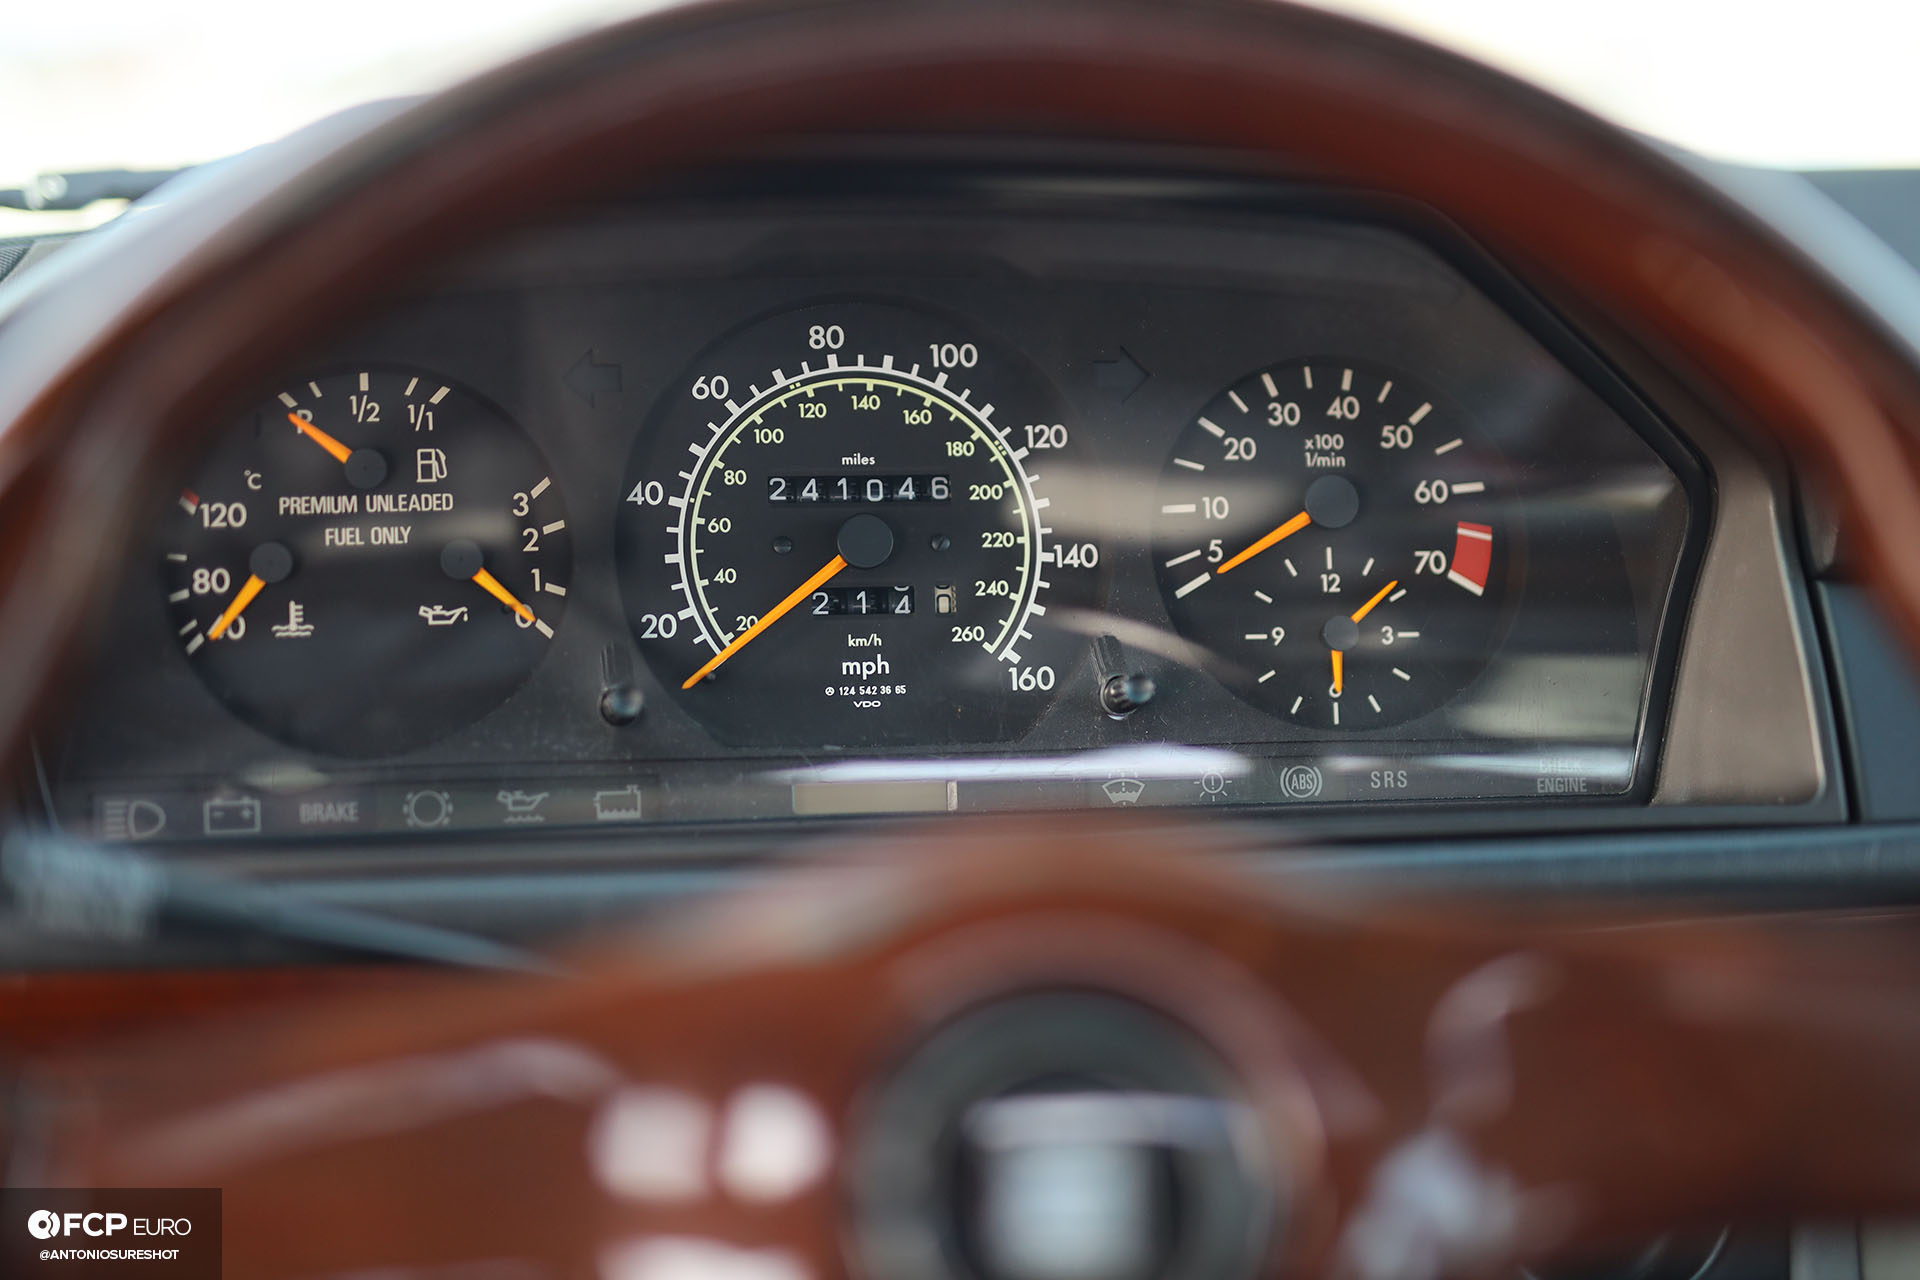 S124 Mercedes Benz E320 wagon high mileage